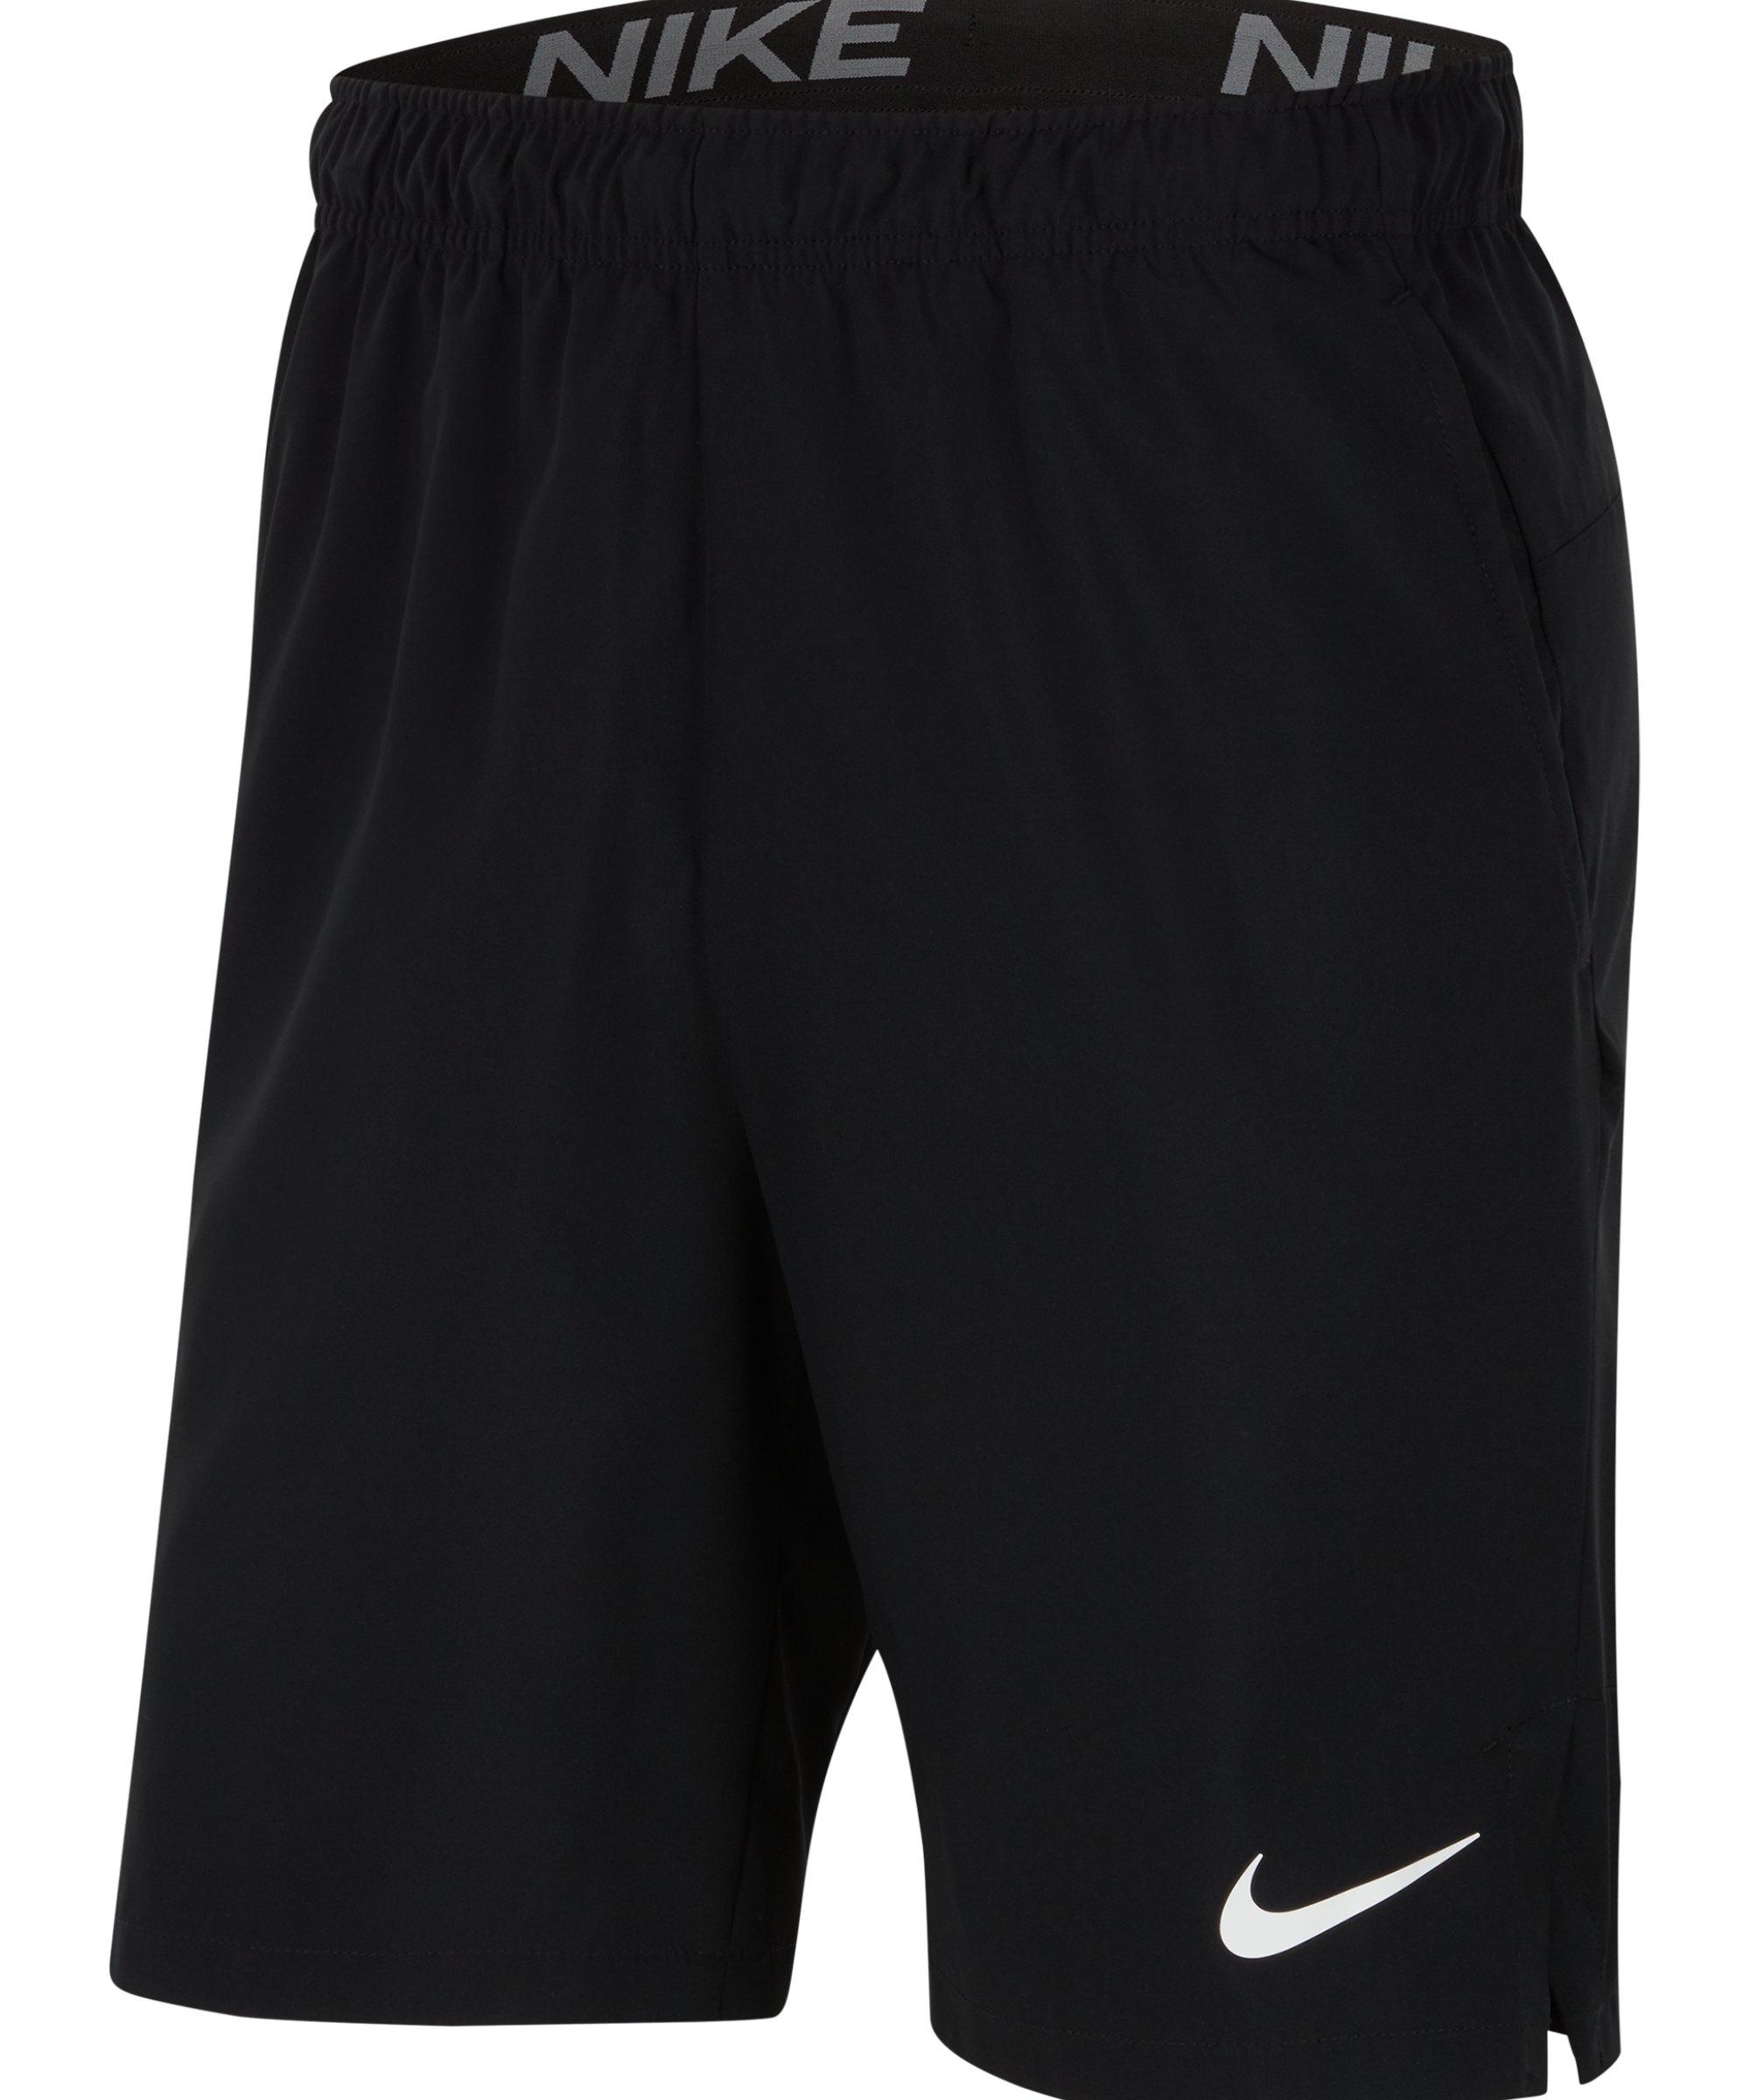 Nike Flex Woven Short Schwarz F010 - schwarz